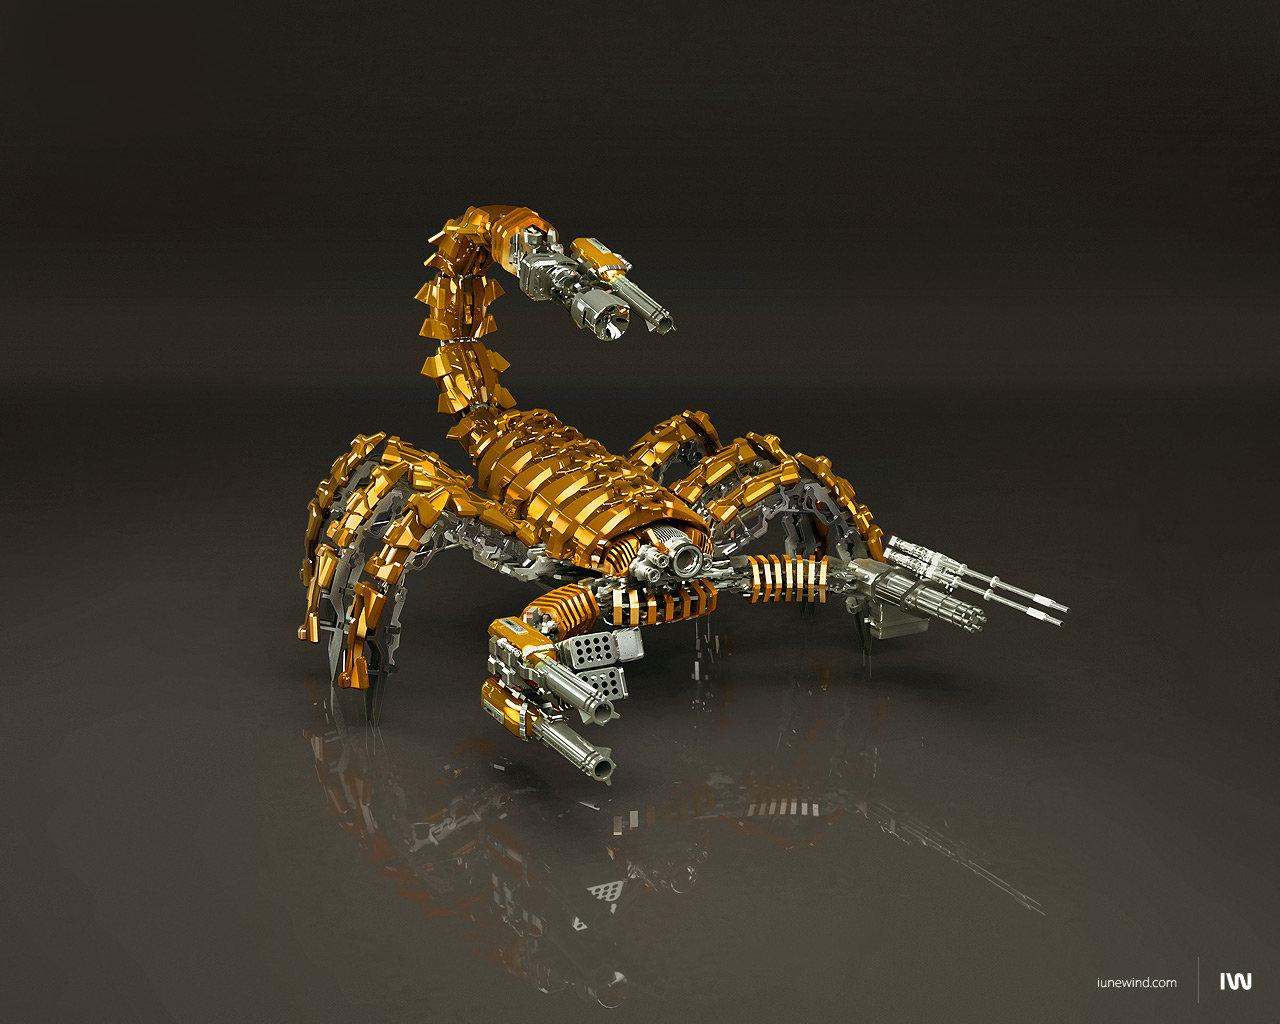 Mad scorpion Gold Edition by iuneWind 1280x1024